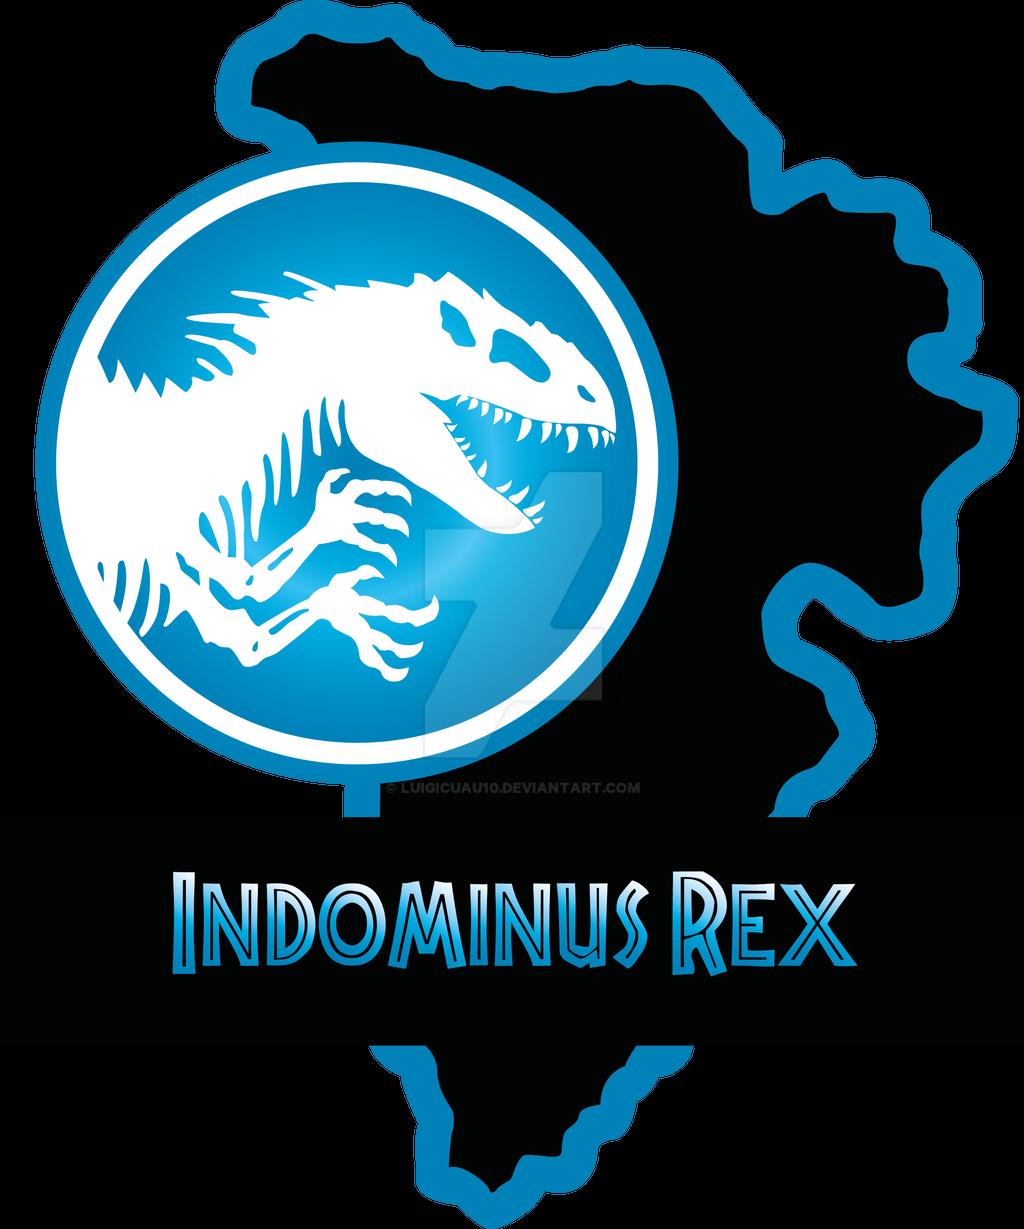 Indominus Rex Paddock Sign JP by luigicuau10 on DeviantArt